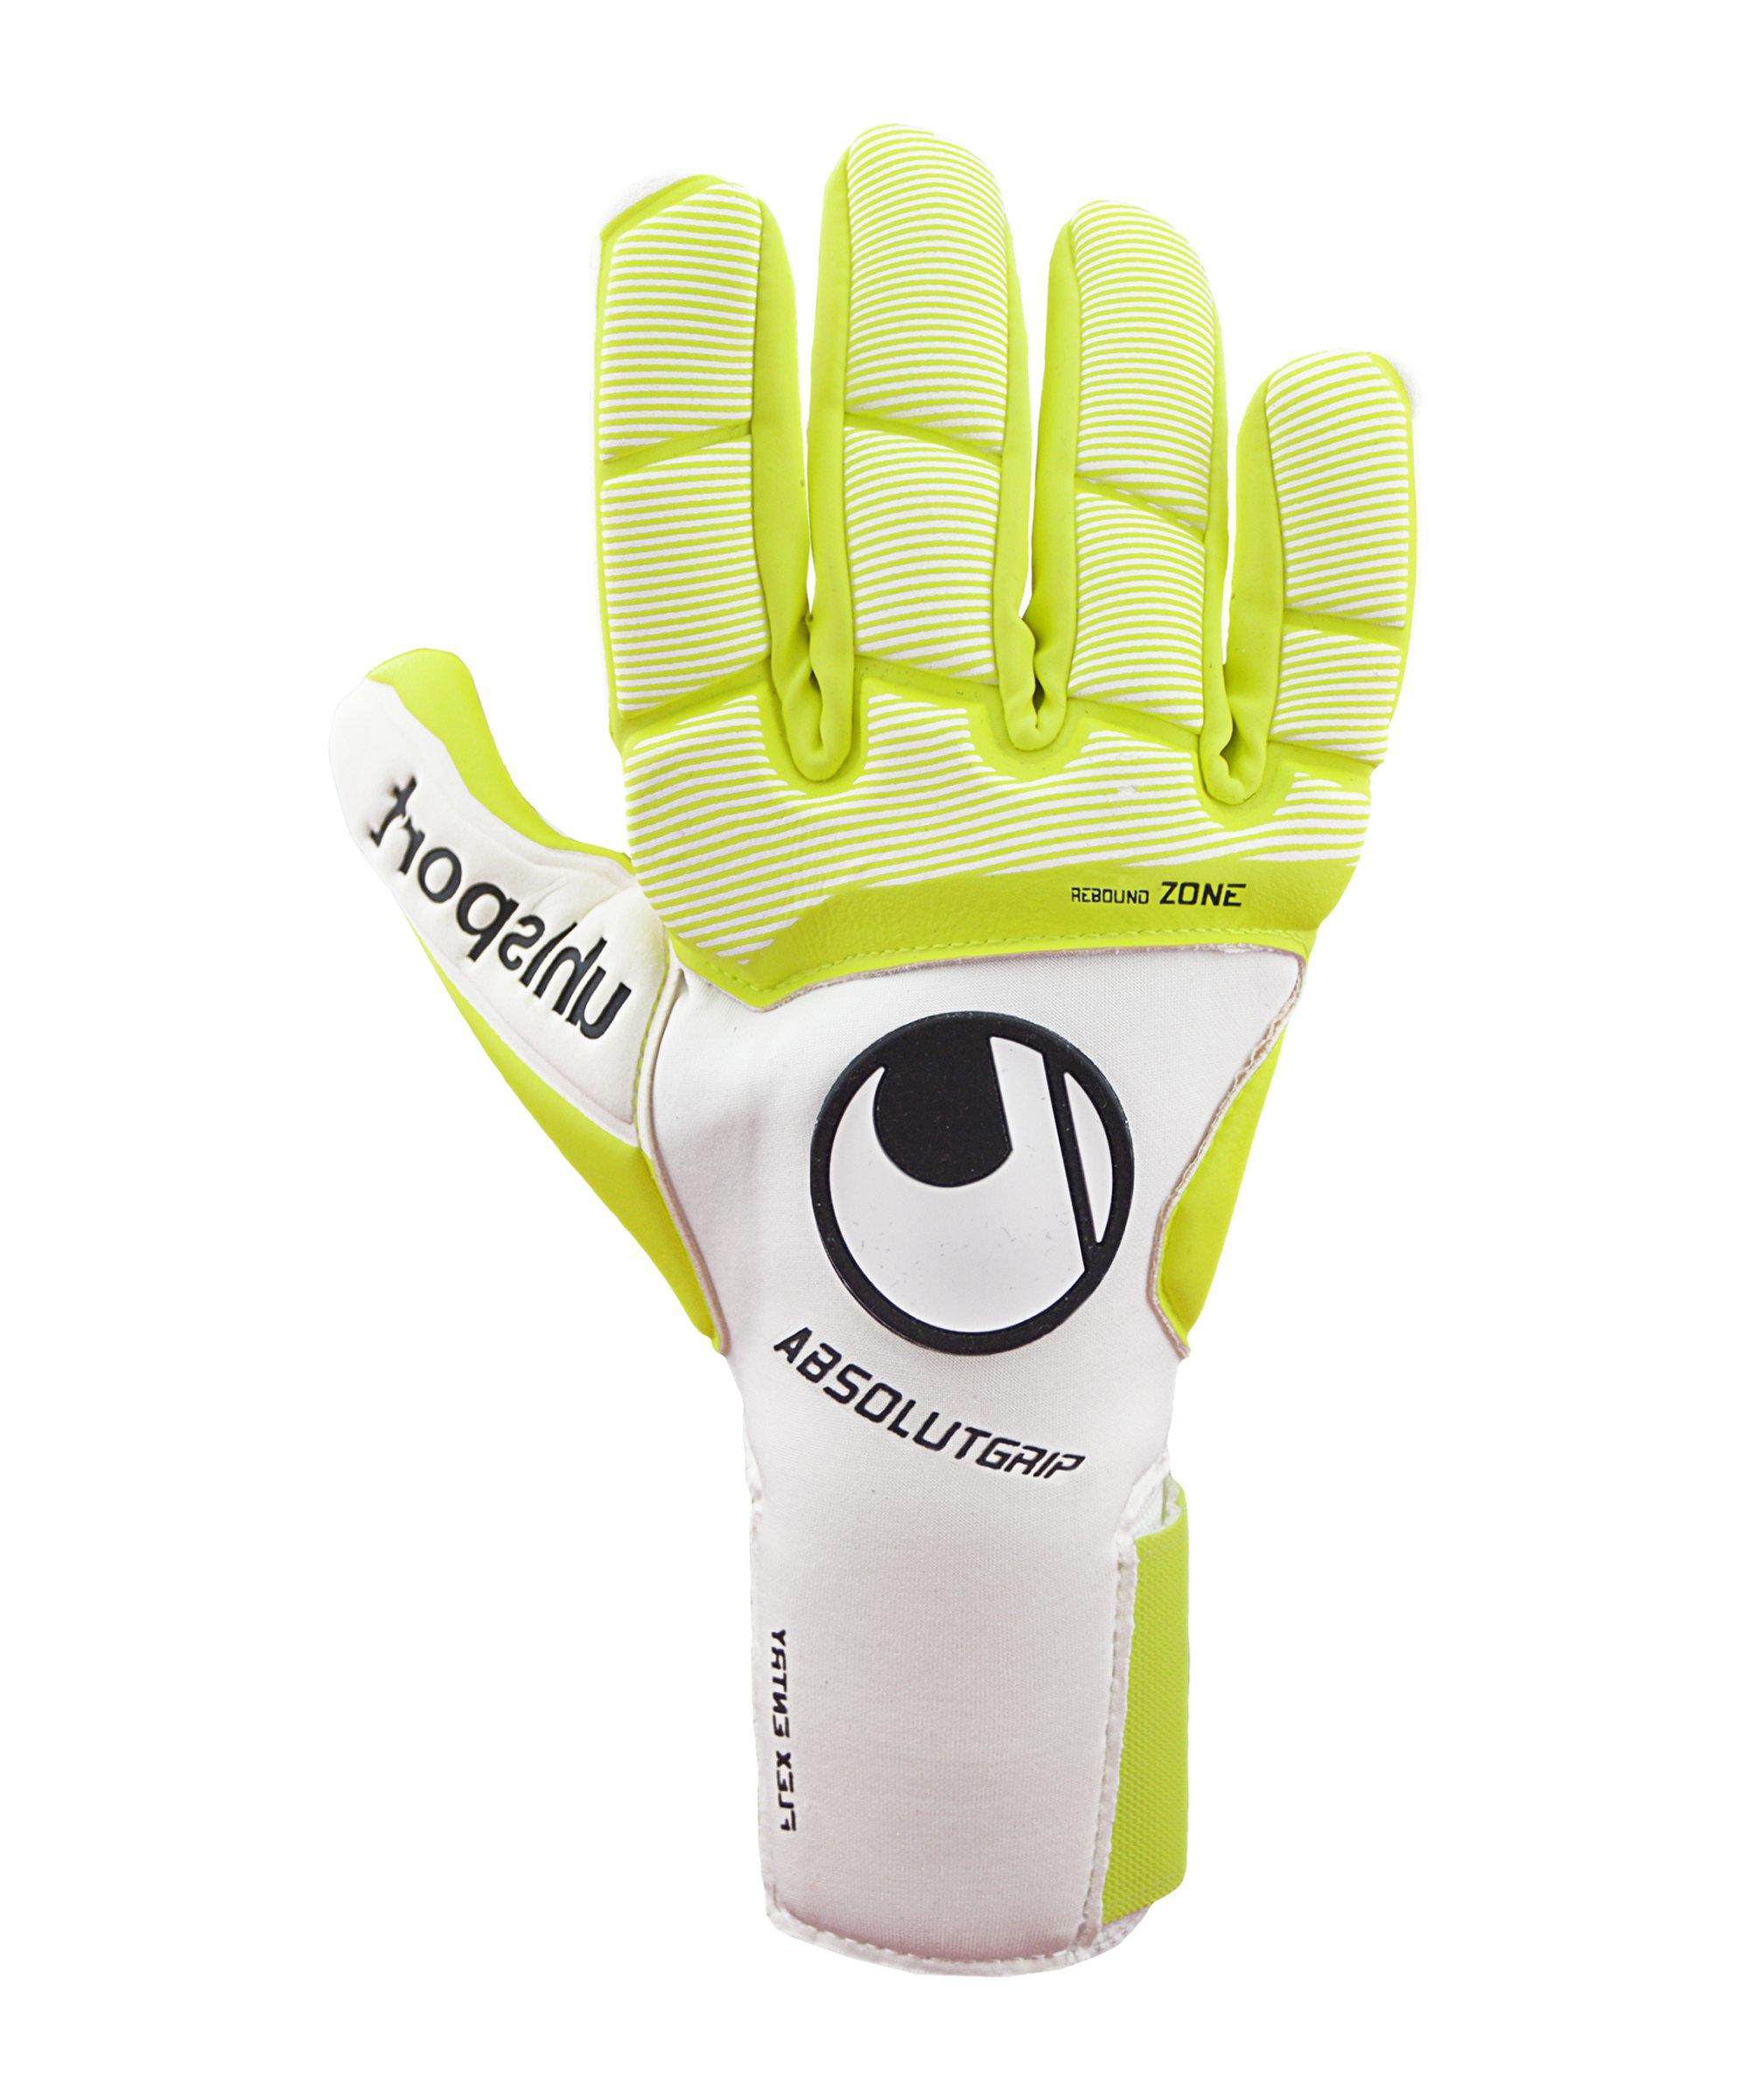 Uhlsport Pure Alliance Absolutgrip HN TW-Handschuh F01 - weiss